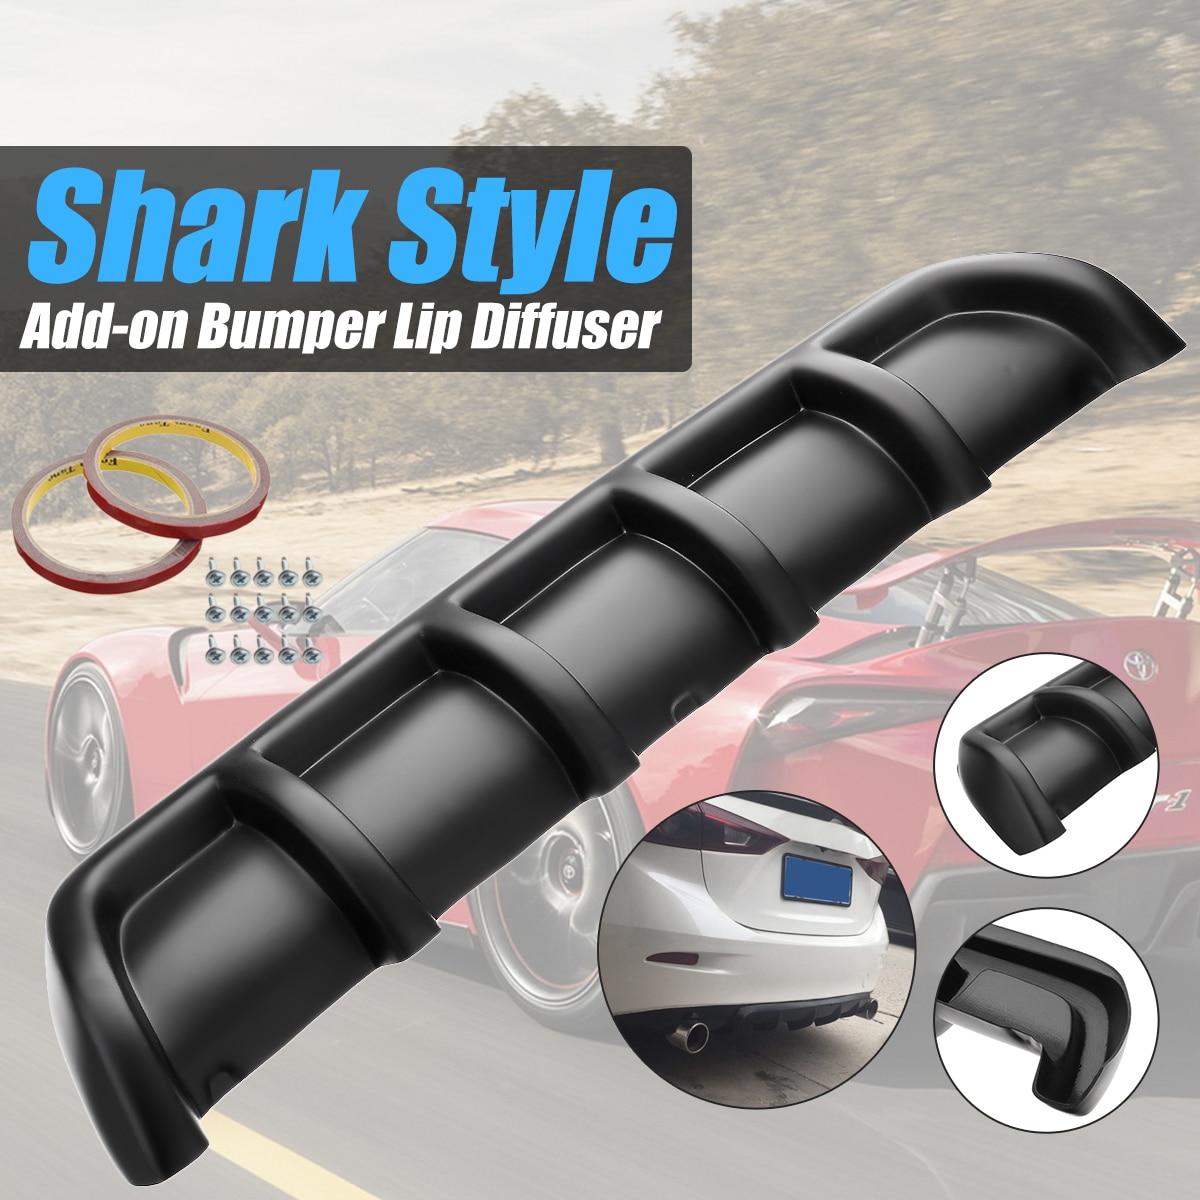 Universal 25x5 Matte Black Car Car Styling Plastic Rear Shark Fin Style Curved Bumper Lip Diffuser Shark 6 Fin Spoiler Kit